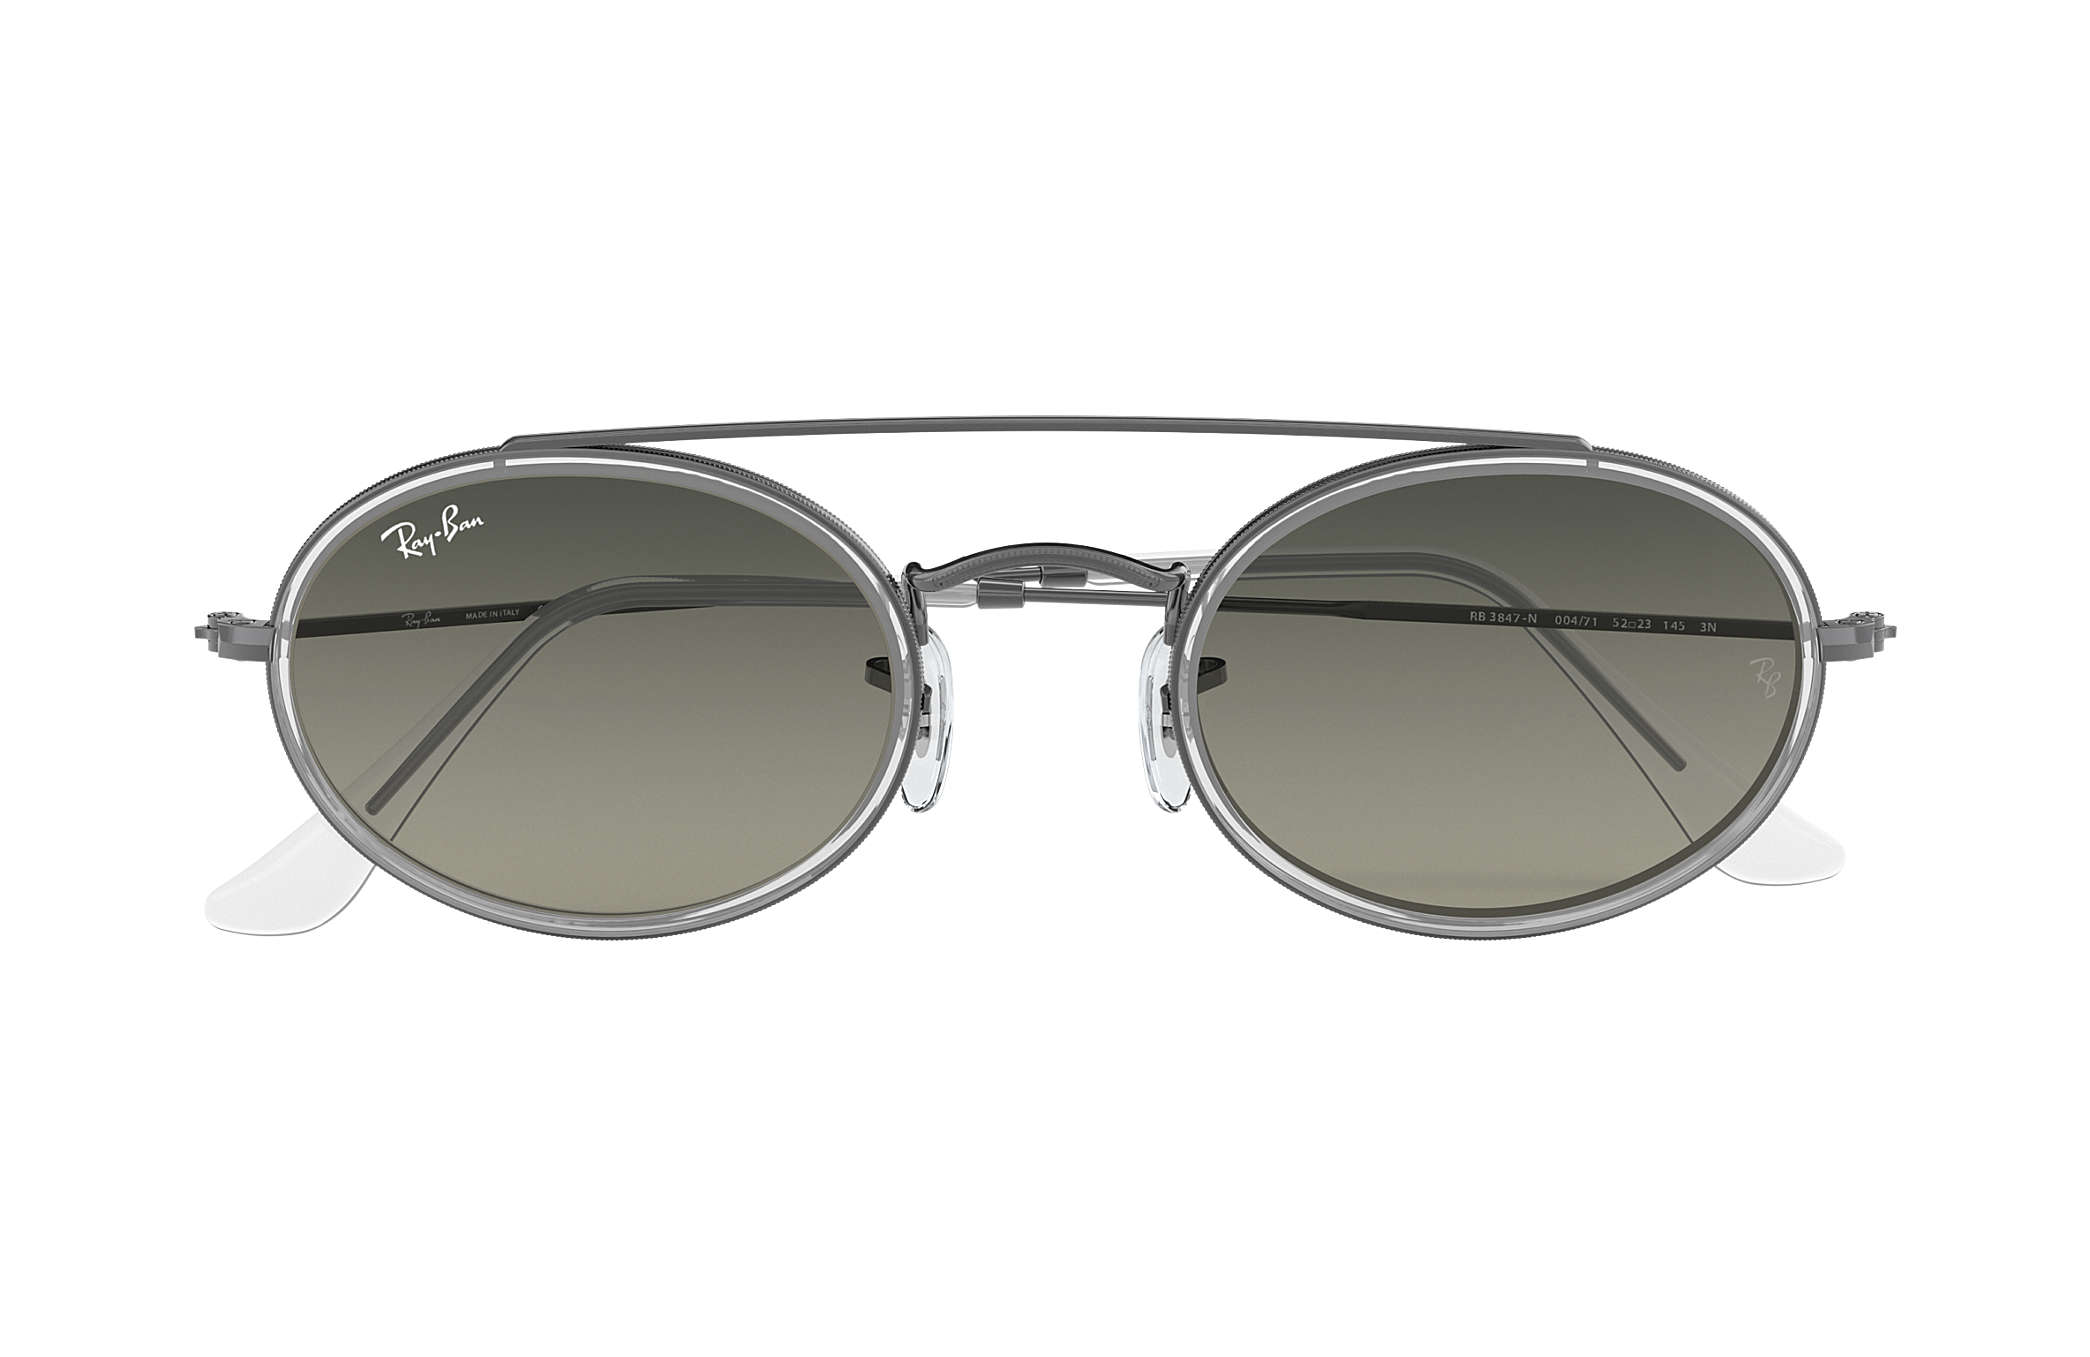 ff6544a084 Ray-Ban Oval Double Bridge RB3847N Gunmetal - Metal - Grey Lenses ...